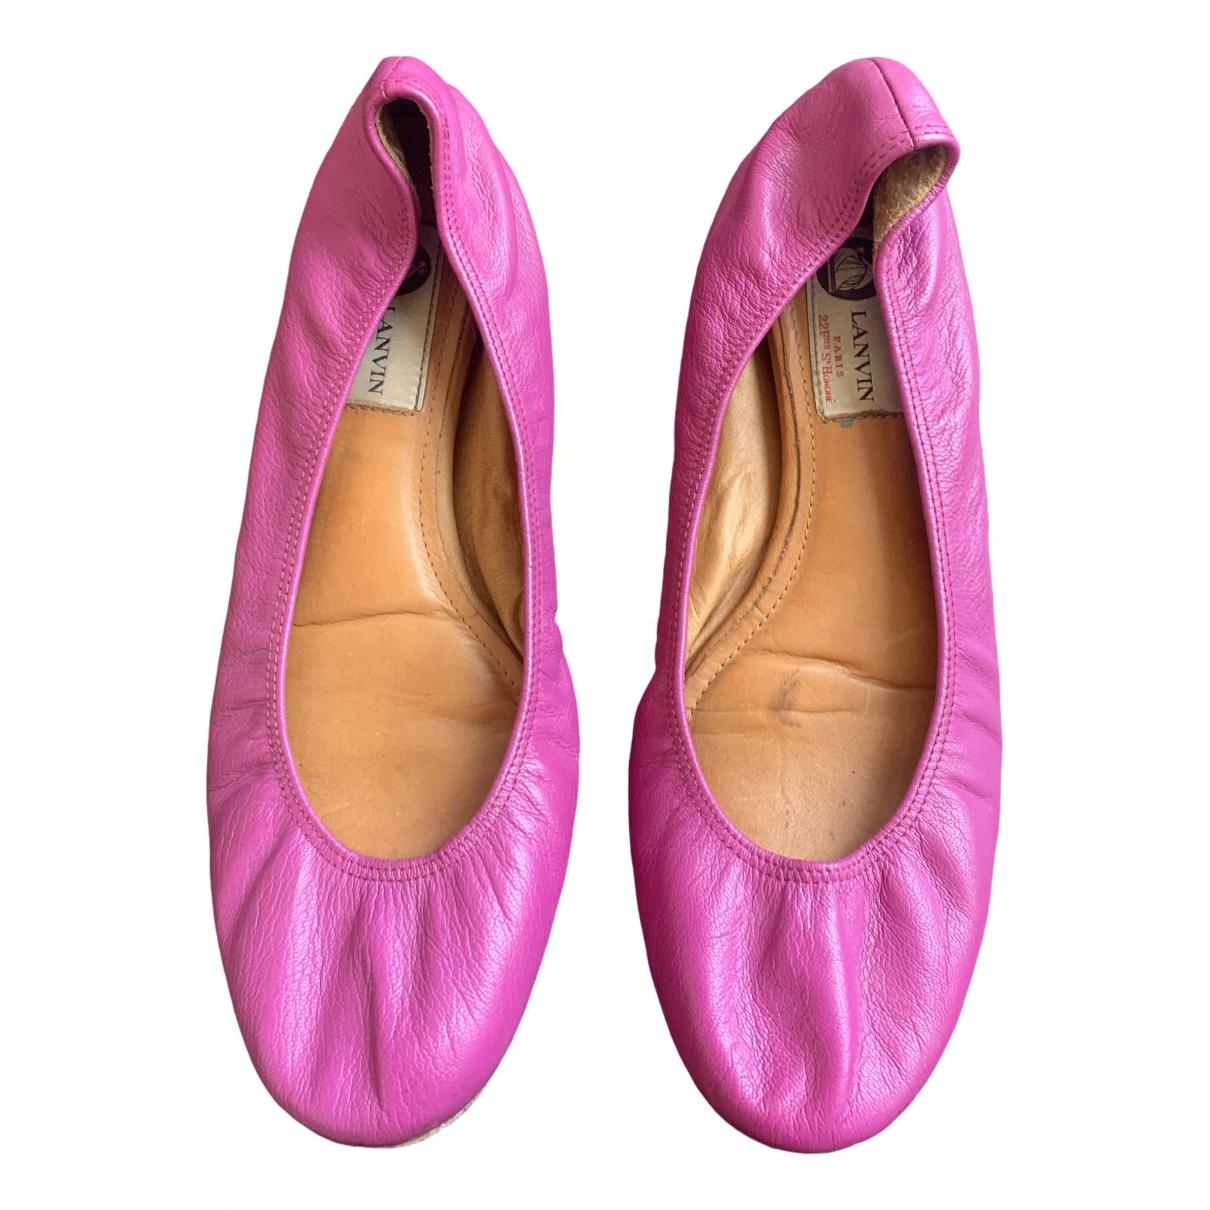 Lanvin \N Pink Leather Ballet flats for Women 39 EU